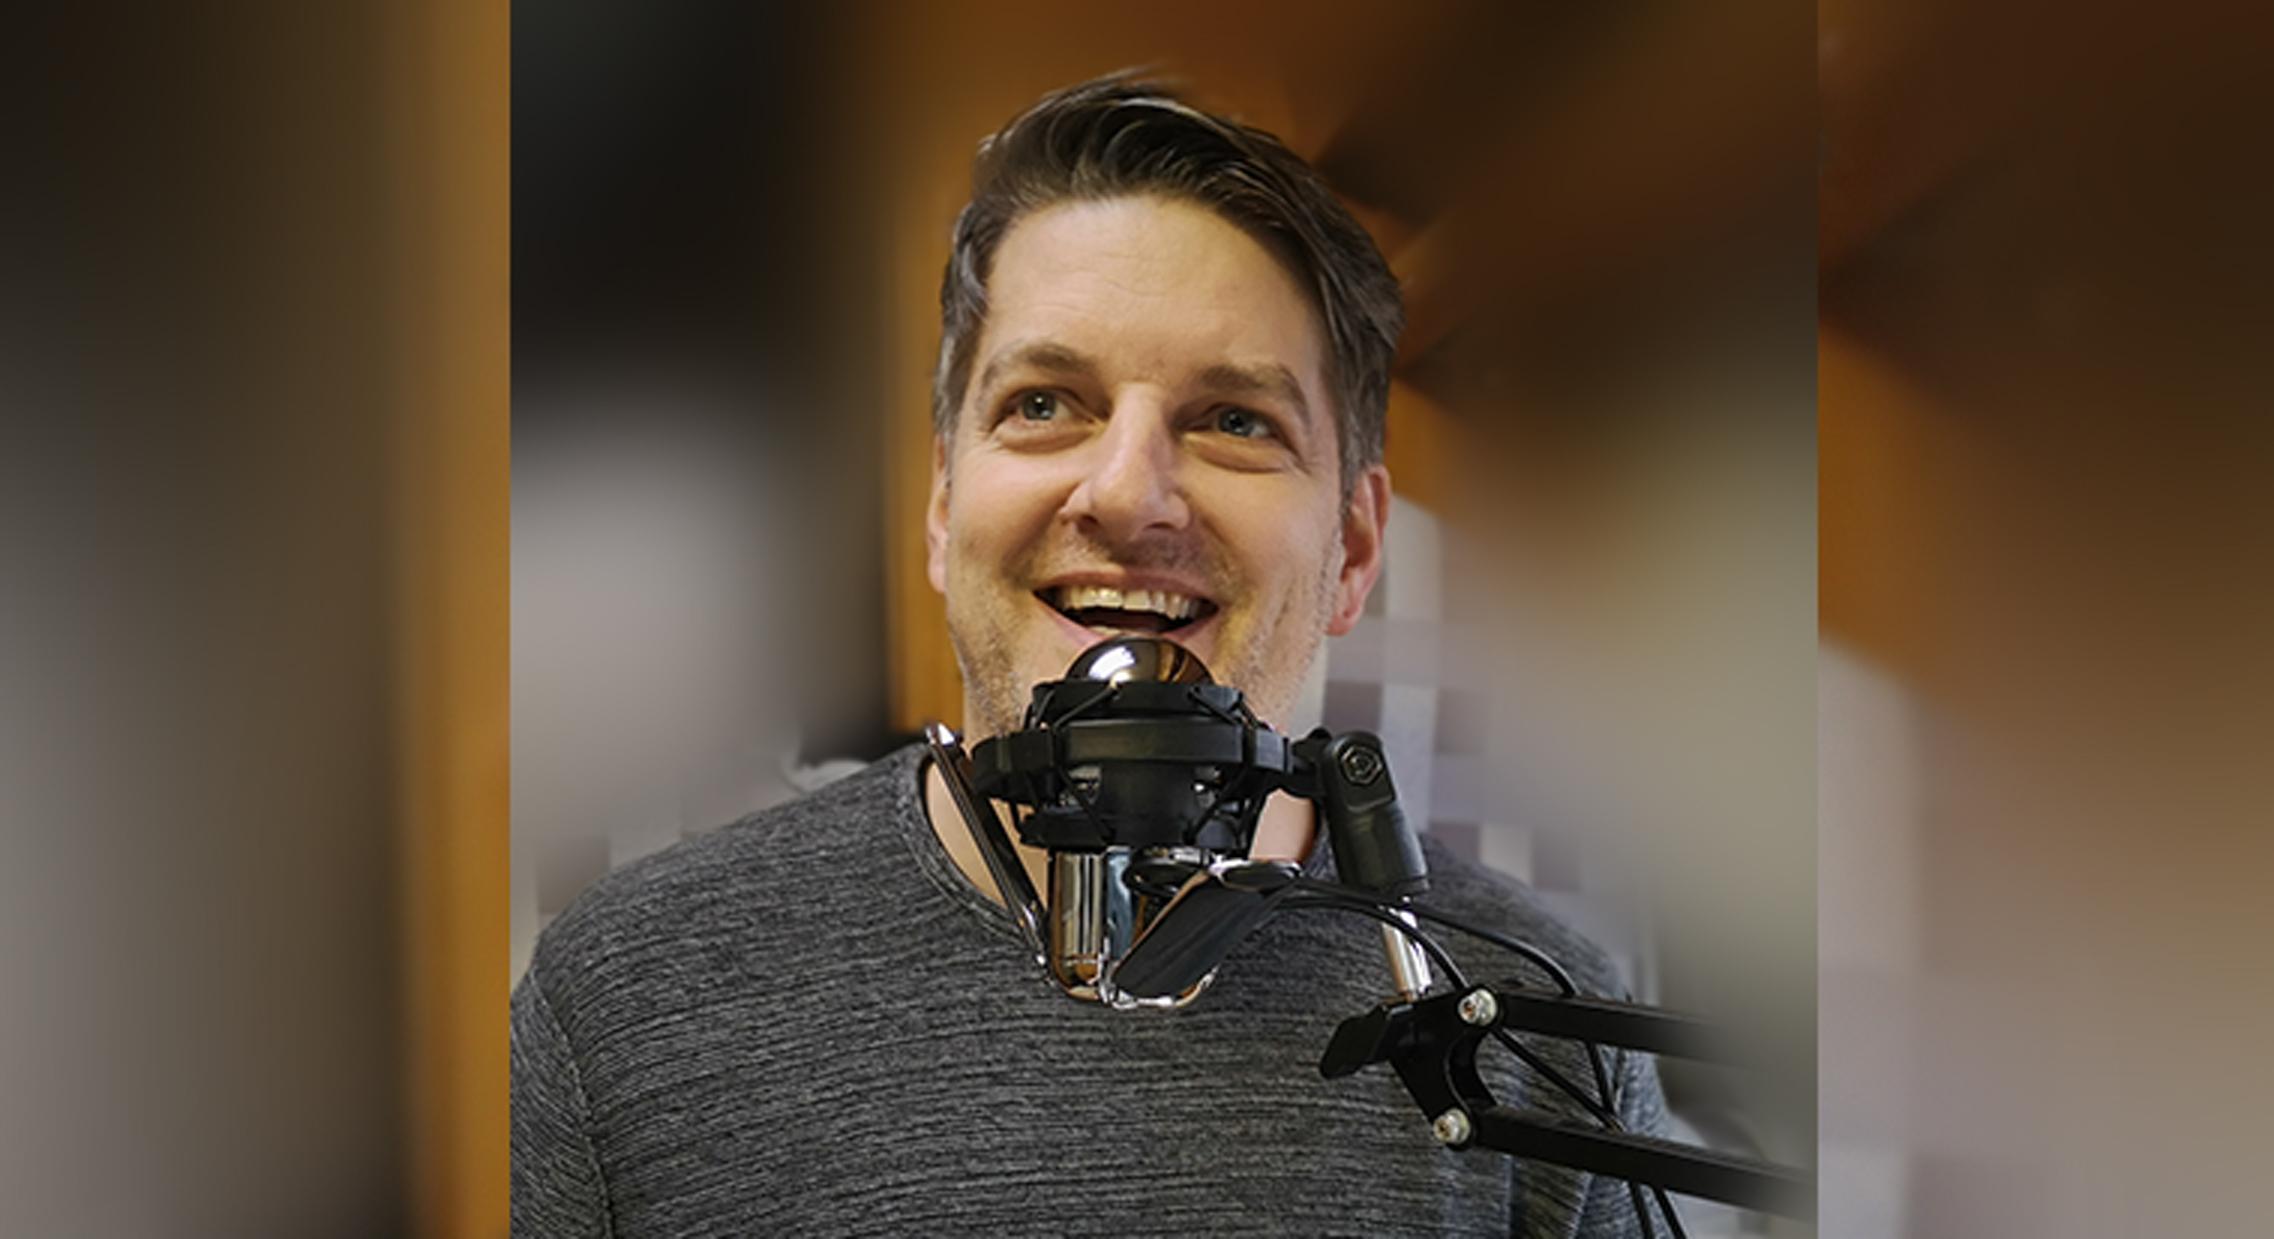 André Christen | Podcast Moderator & Host